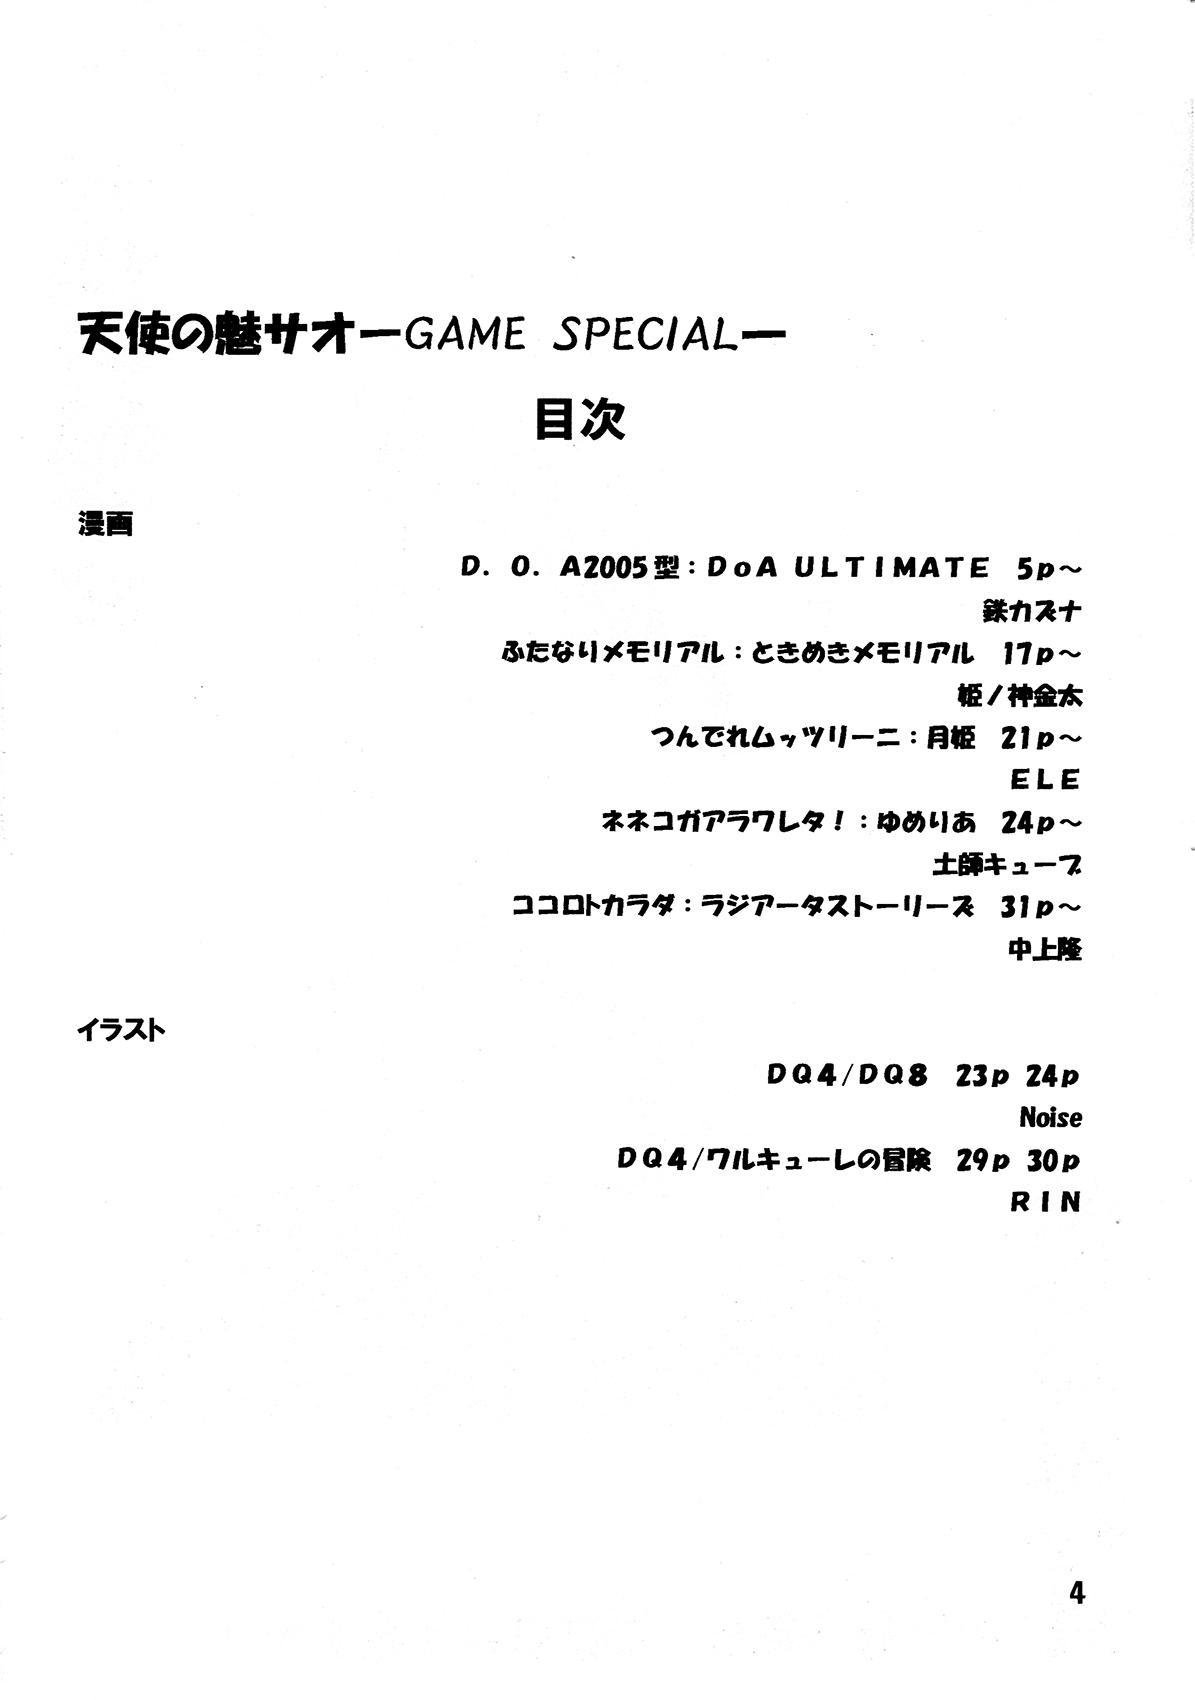 Tenshi no Misao Game Special 3